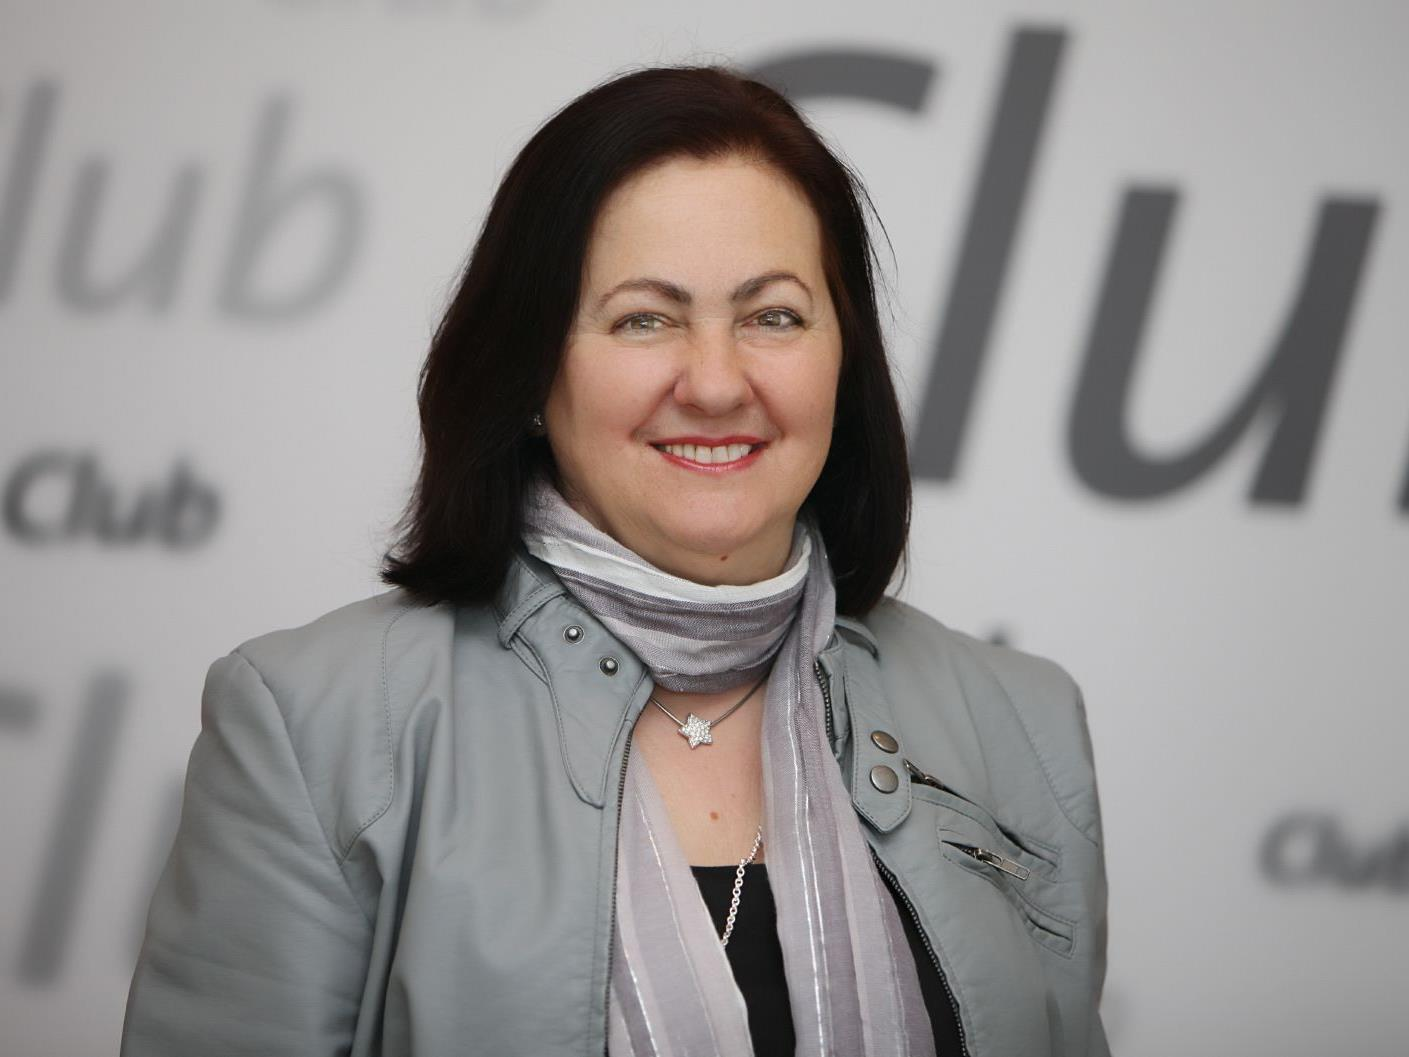 SPÖ-Landesfrauenvorsitzende Olga Pircher